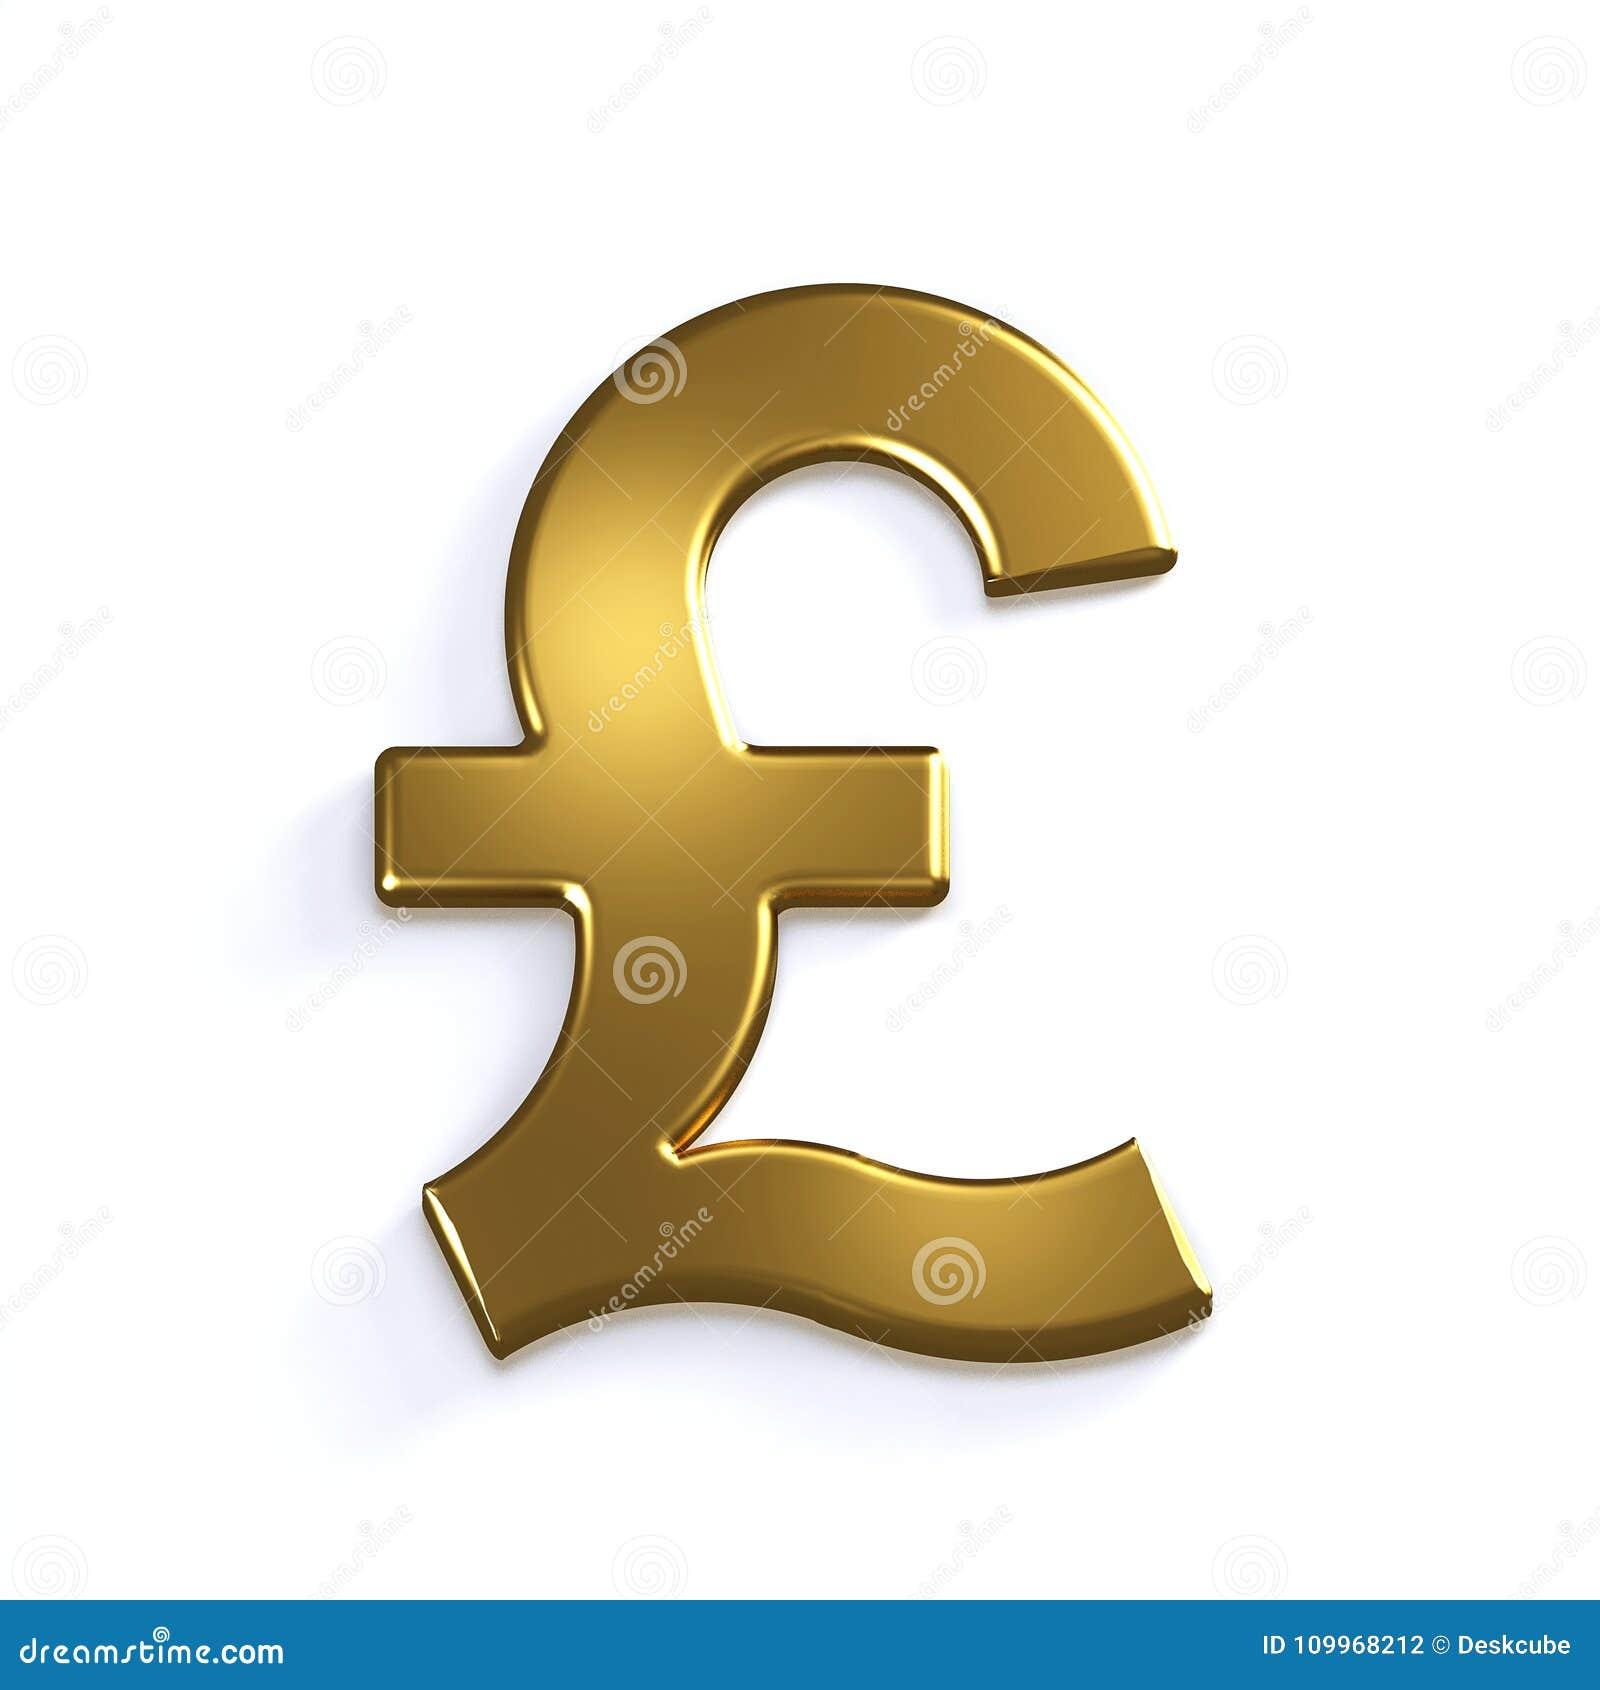 Gold pound symbol 3d render illustration stock illustration gold pound symbol 3d render illustration buycottarizona Choice Image